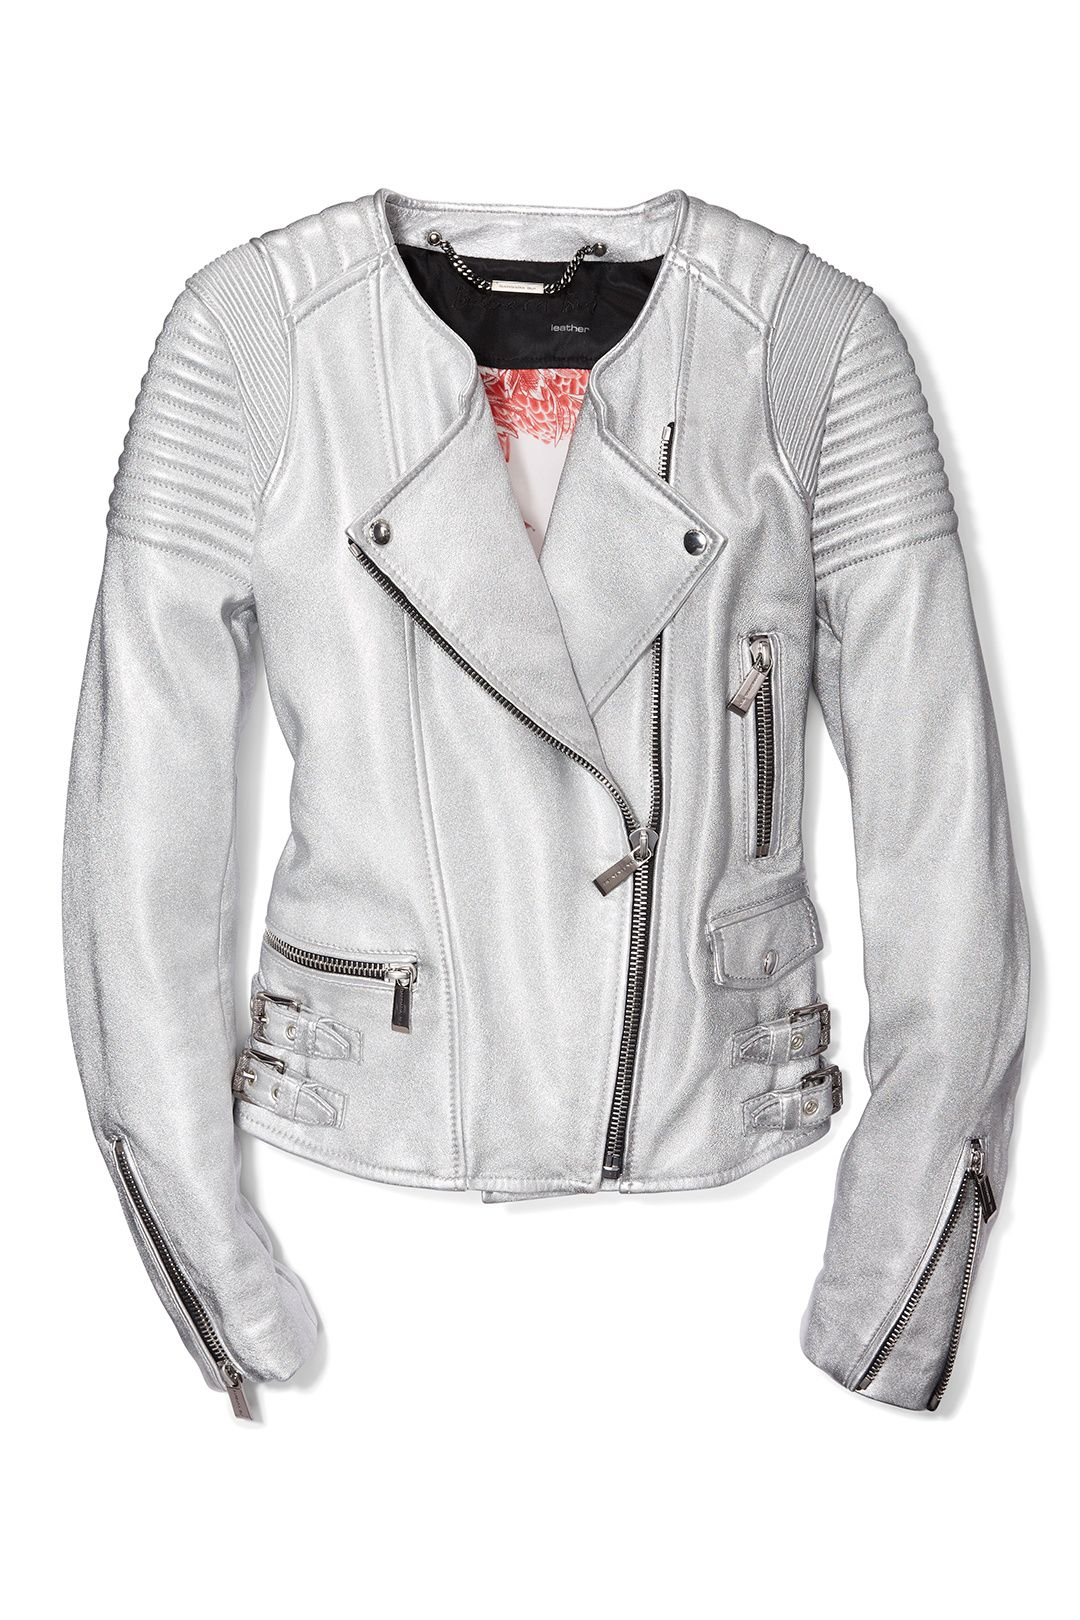 Bui Game Barbara Thriller Biker Your In JacketUp Style IymY67gvbf